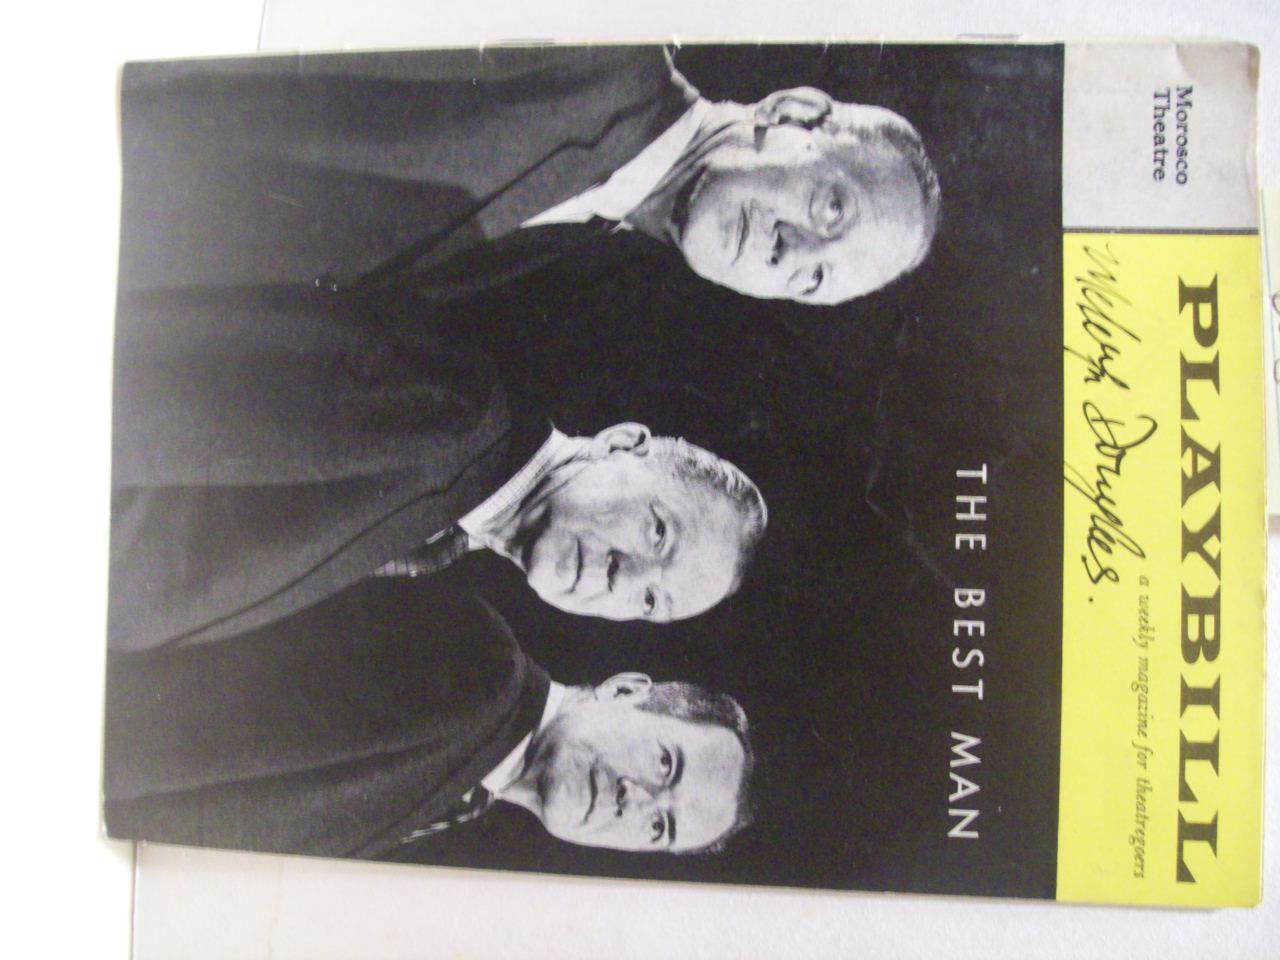 Douglas, Melvyn Playbill Signed Autograph The Best Man 1961